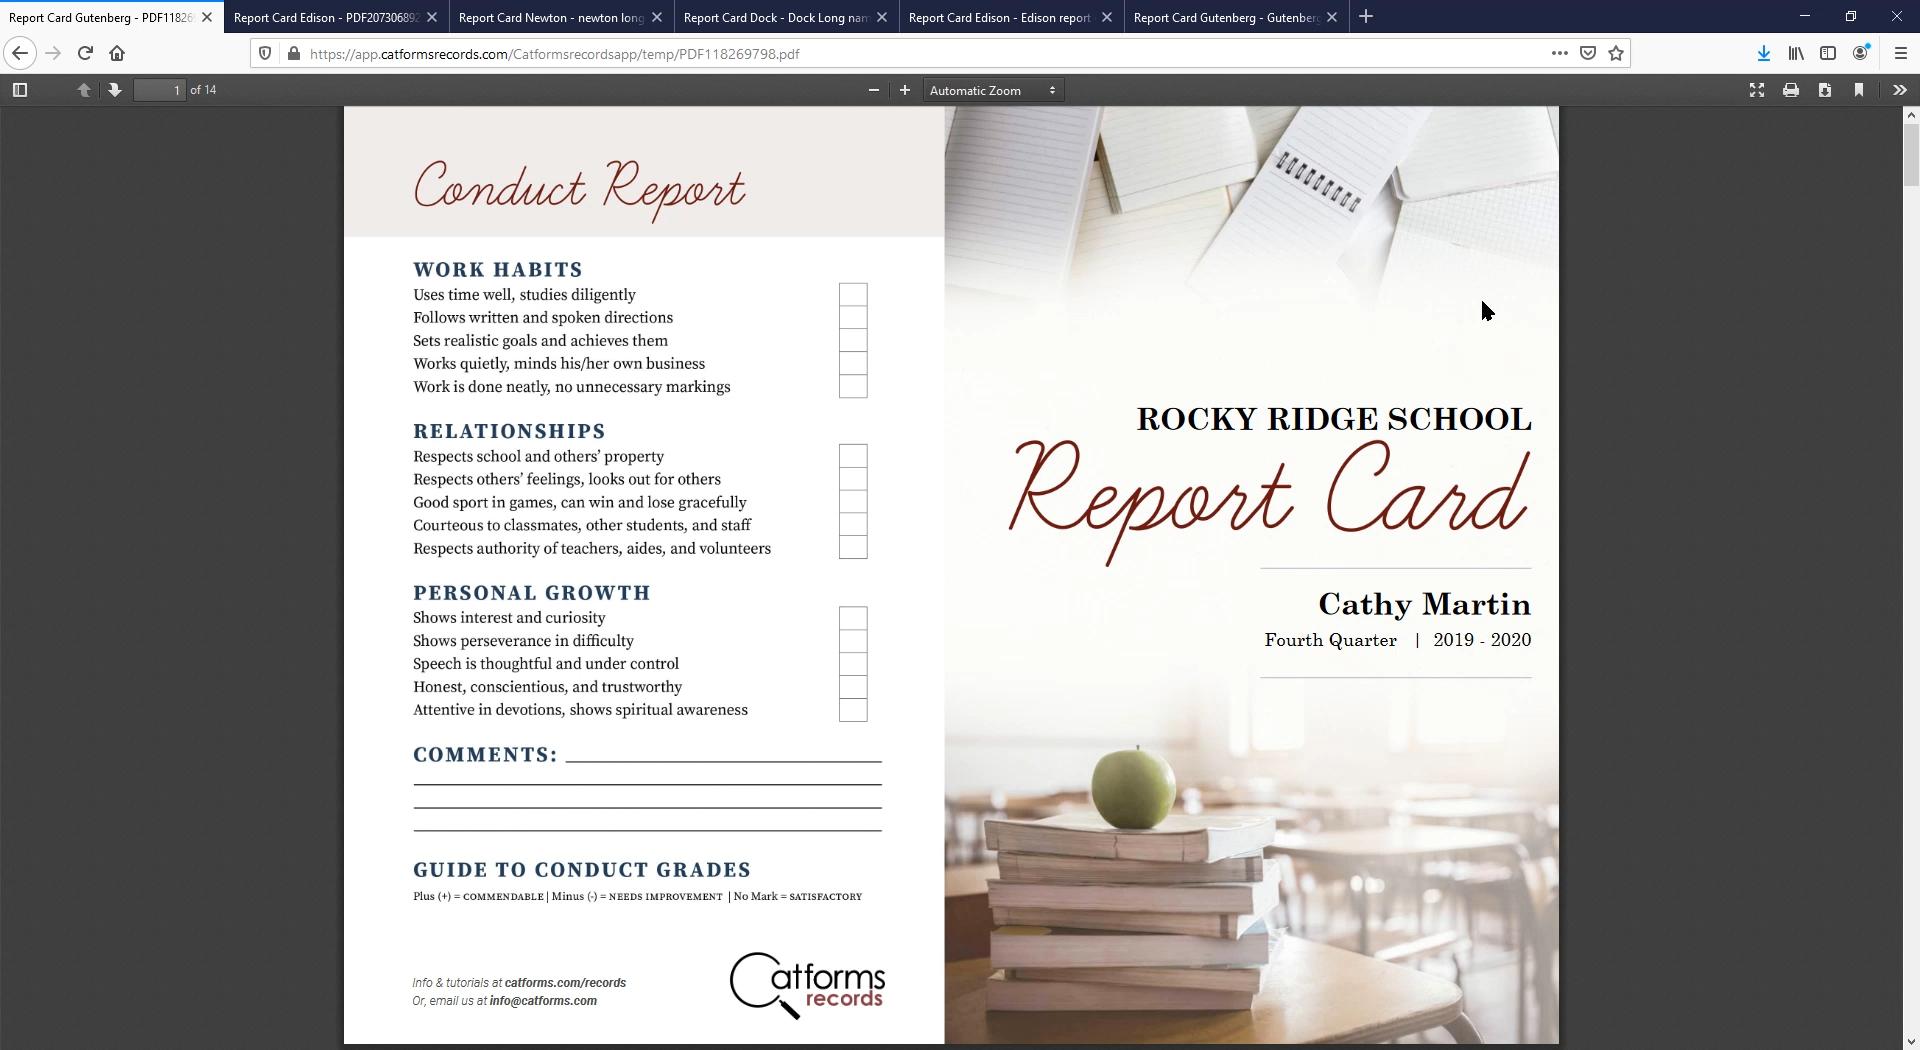 Report Card Info